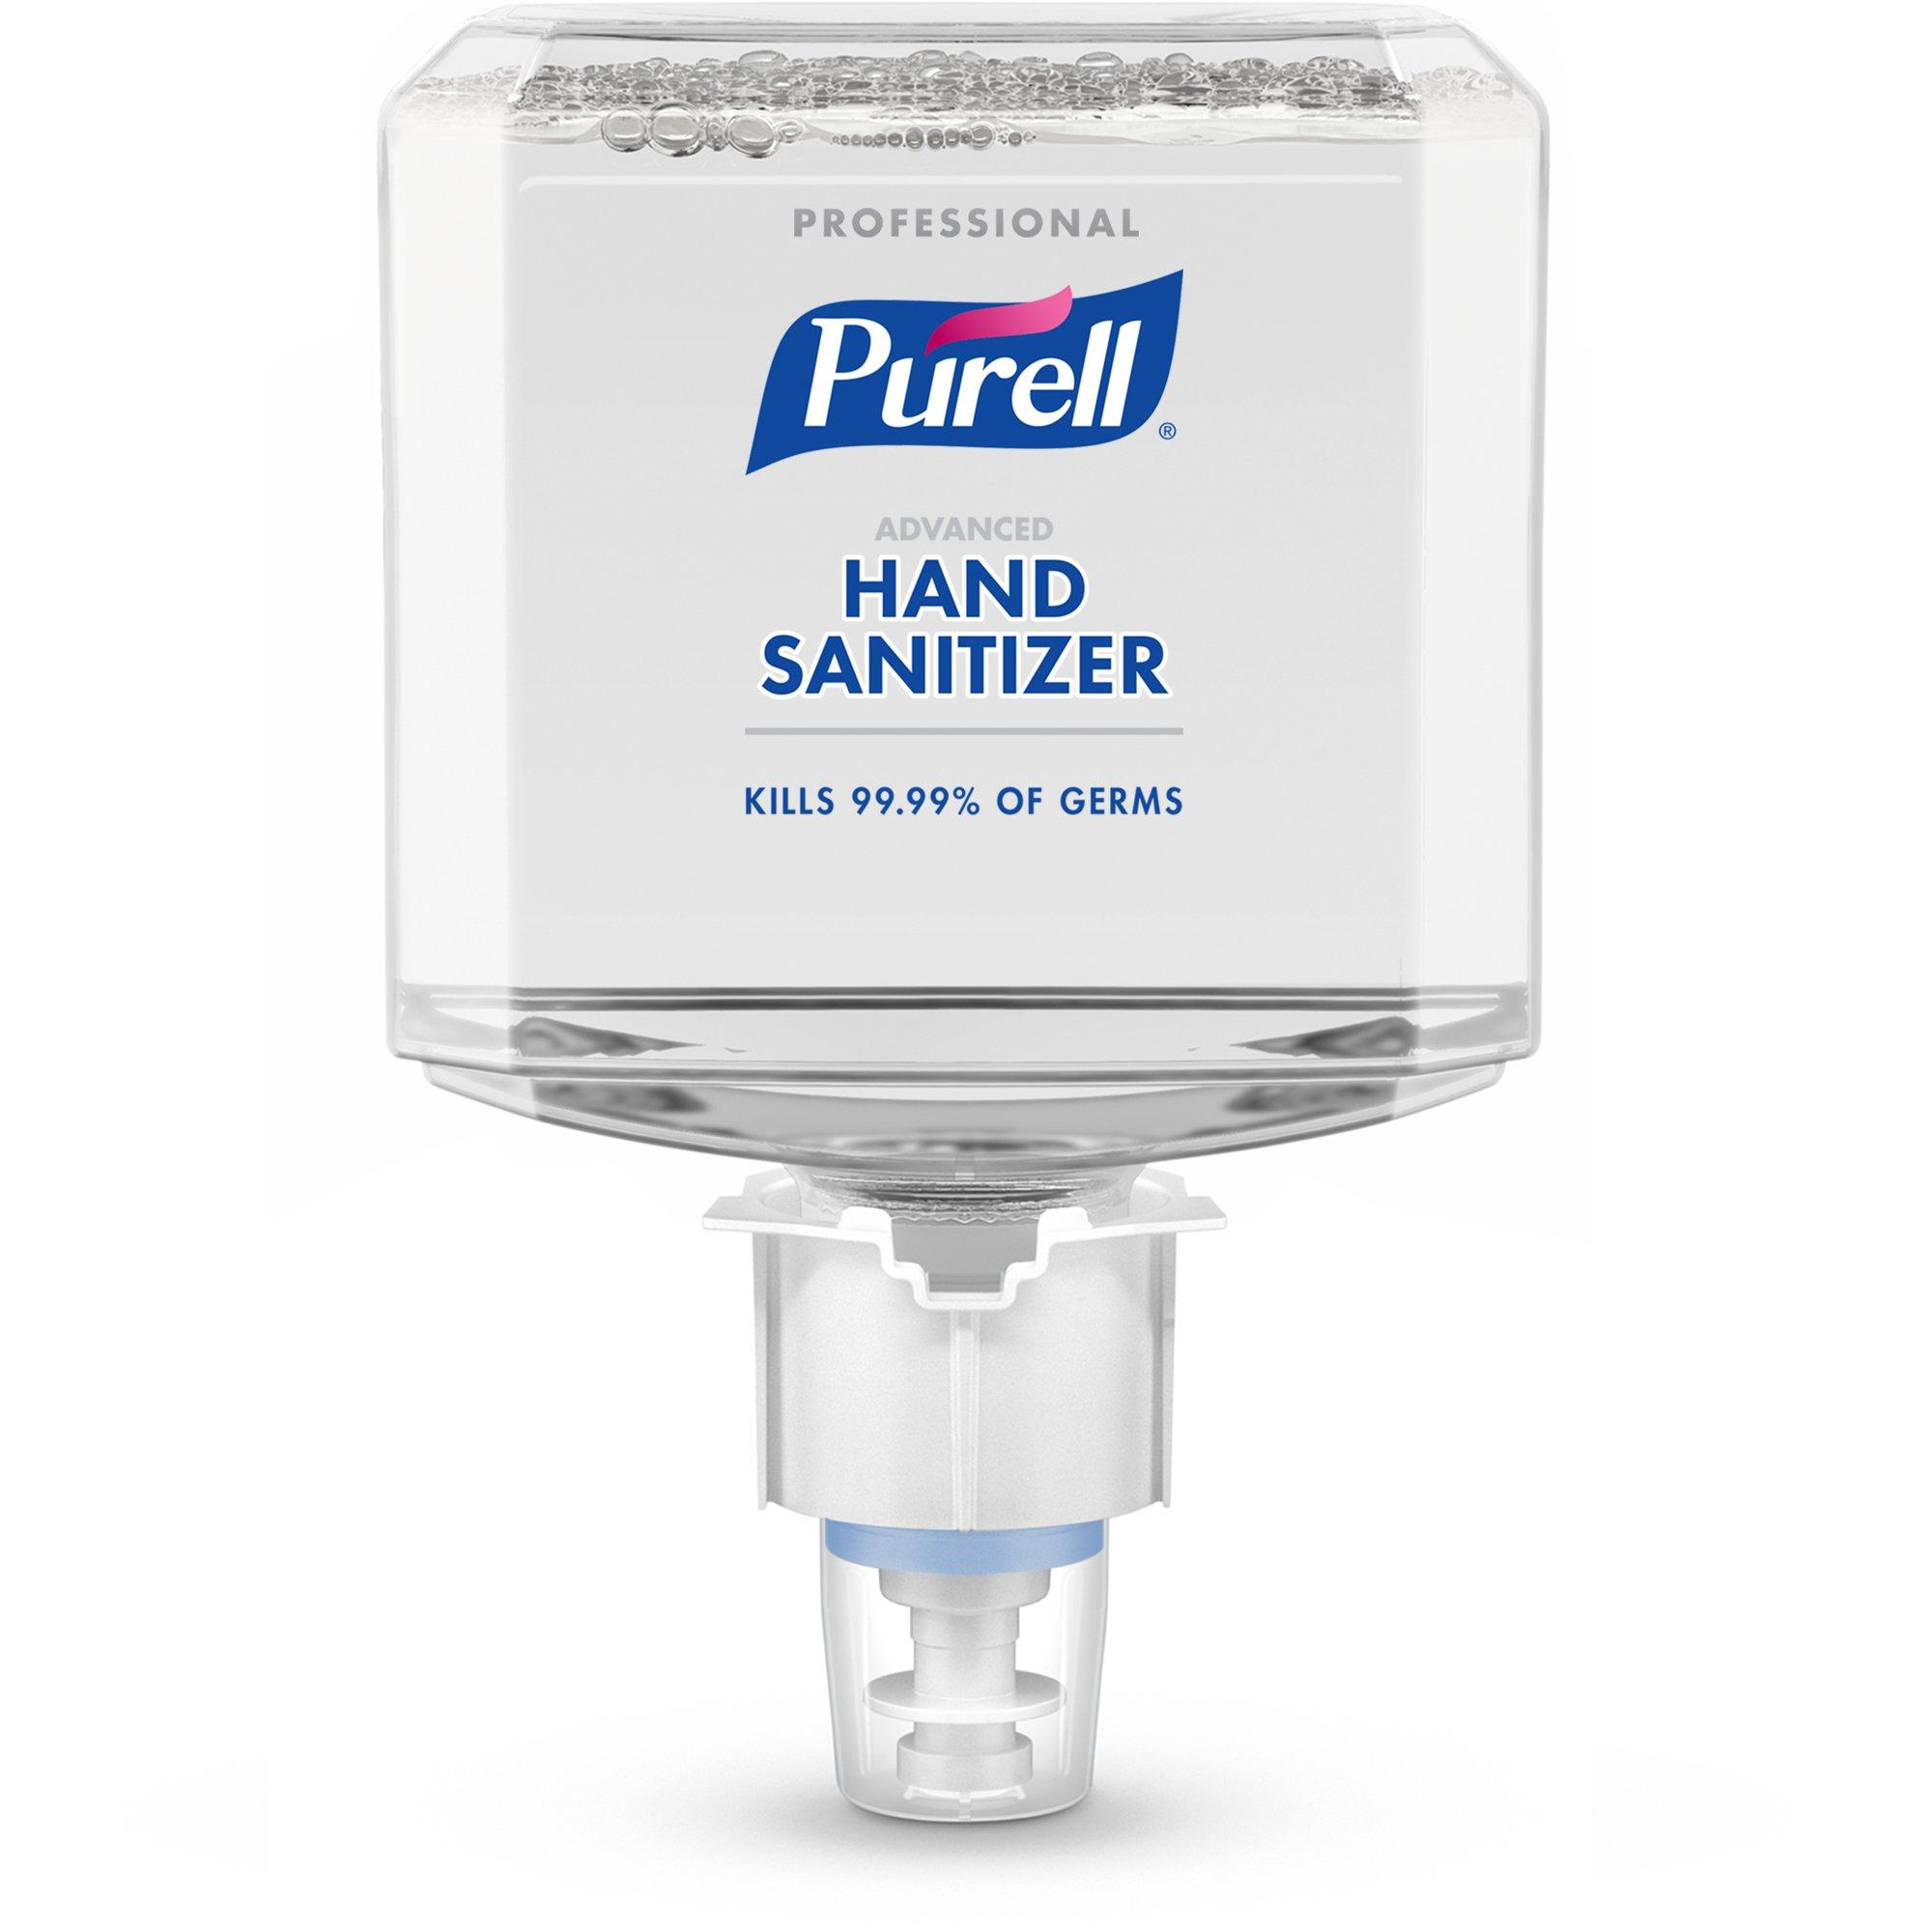 PURELL Professional Advanced Hand Sanitizer Foam Refill, 1200mL Refill for ES4 Hand Sanitizer Dispenser (Pack of 2) - 5054-02